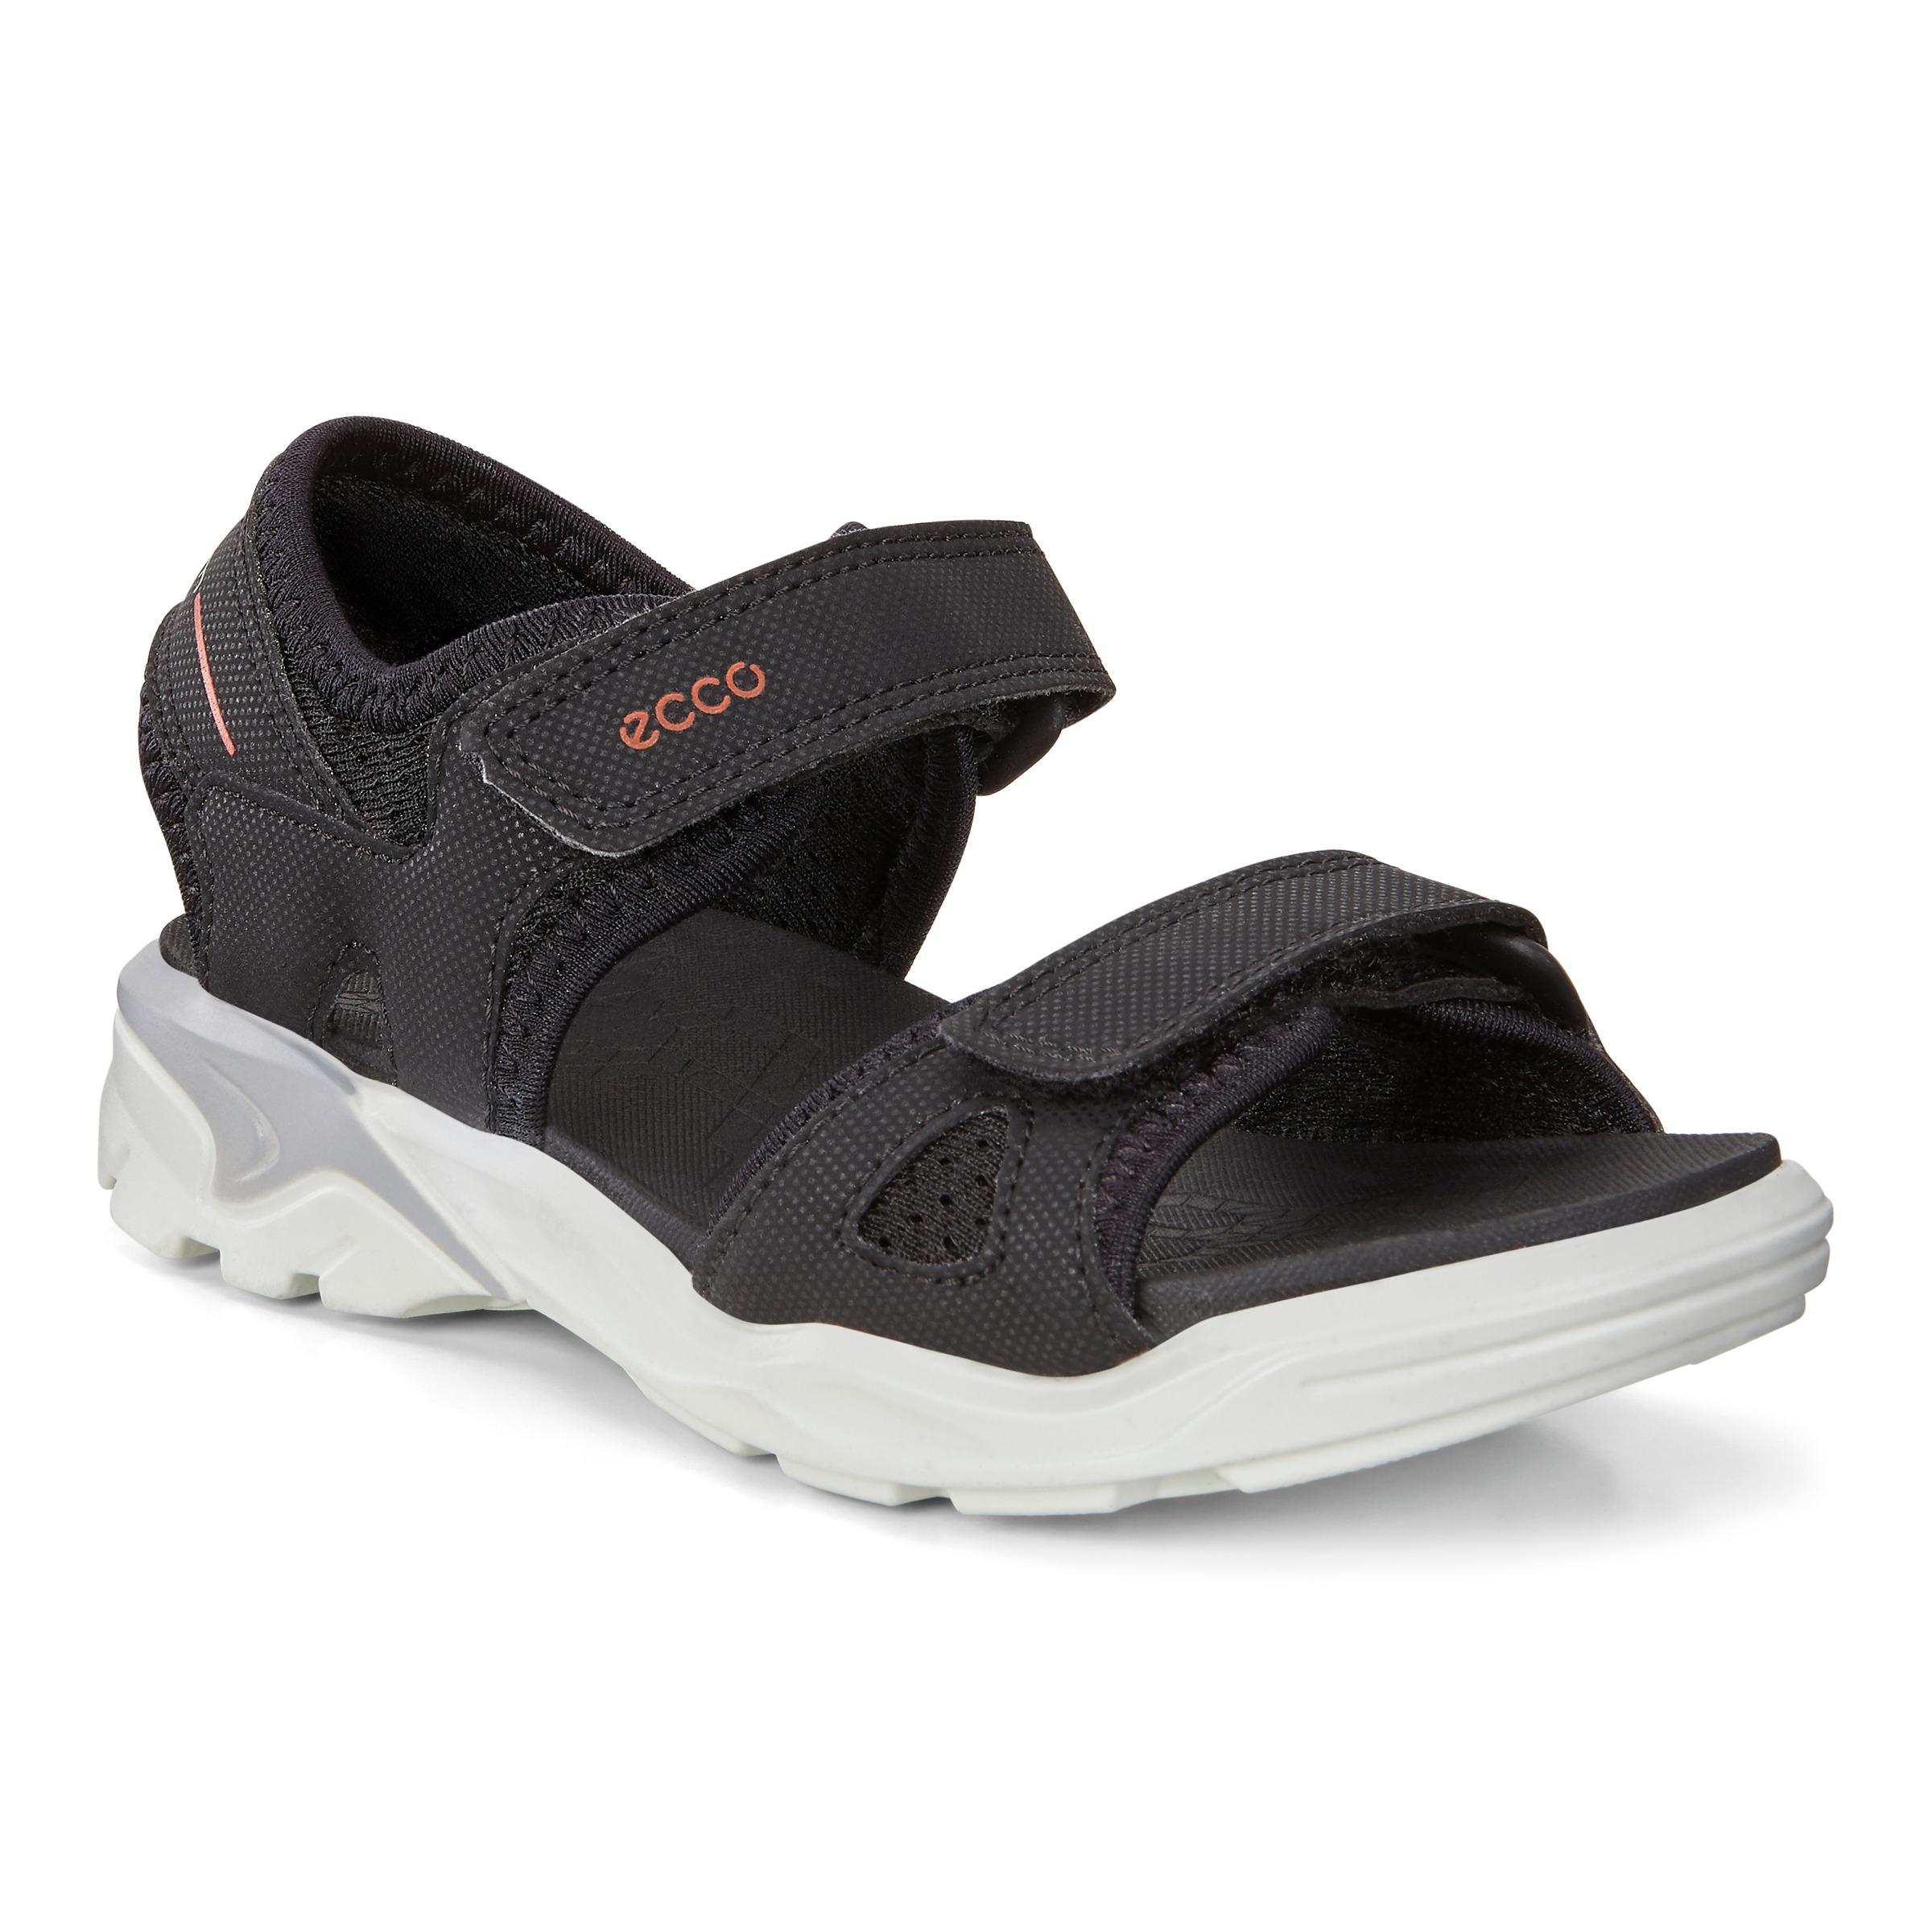 Ecco 700642 sandal